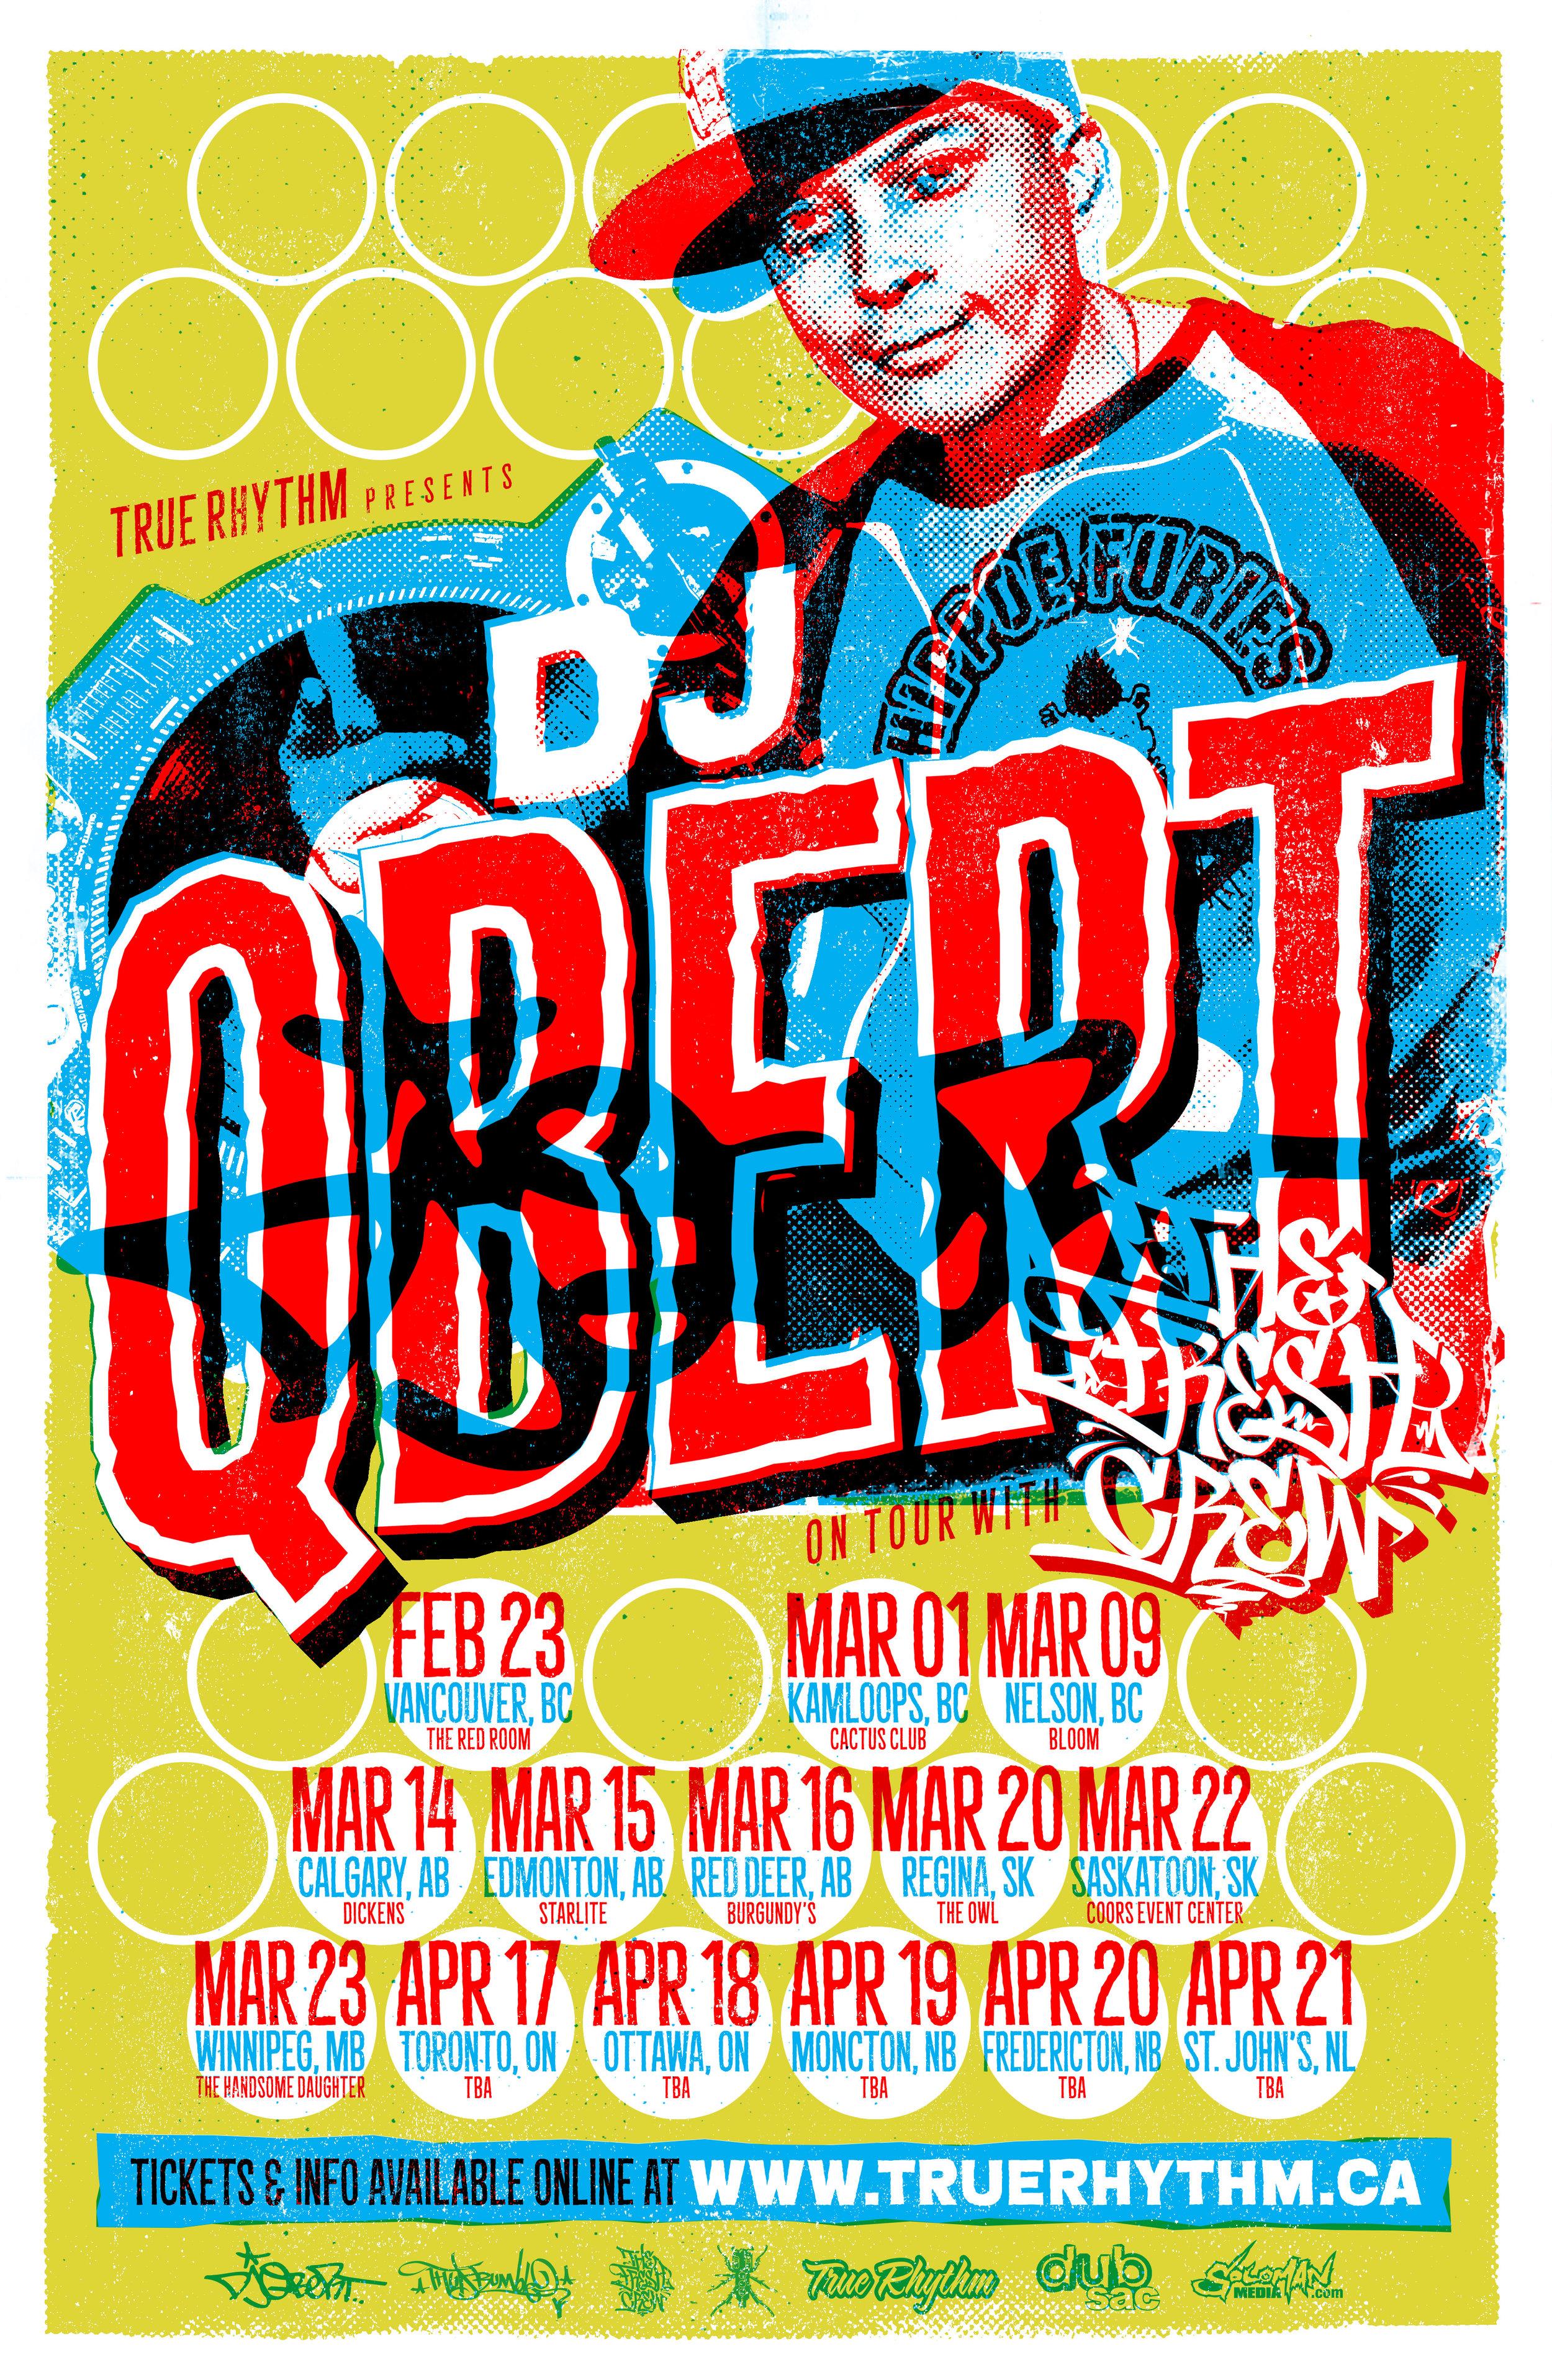 truerhythm_2019_qbert_TOUR.jpg